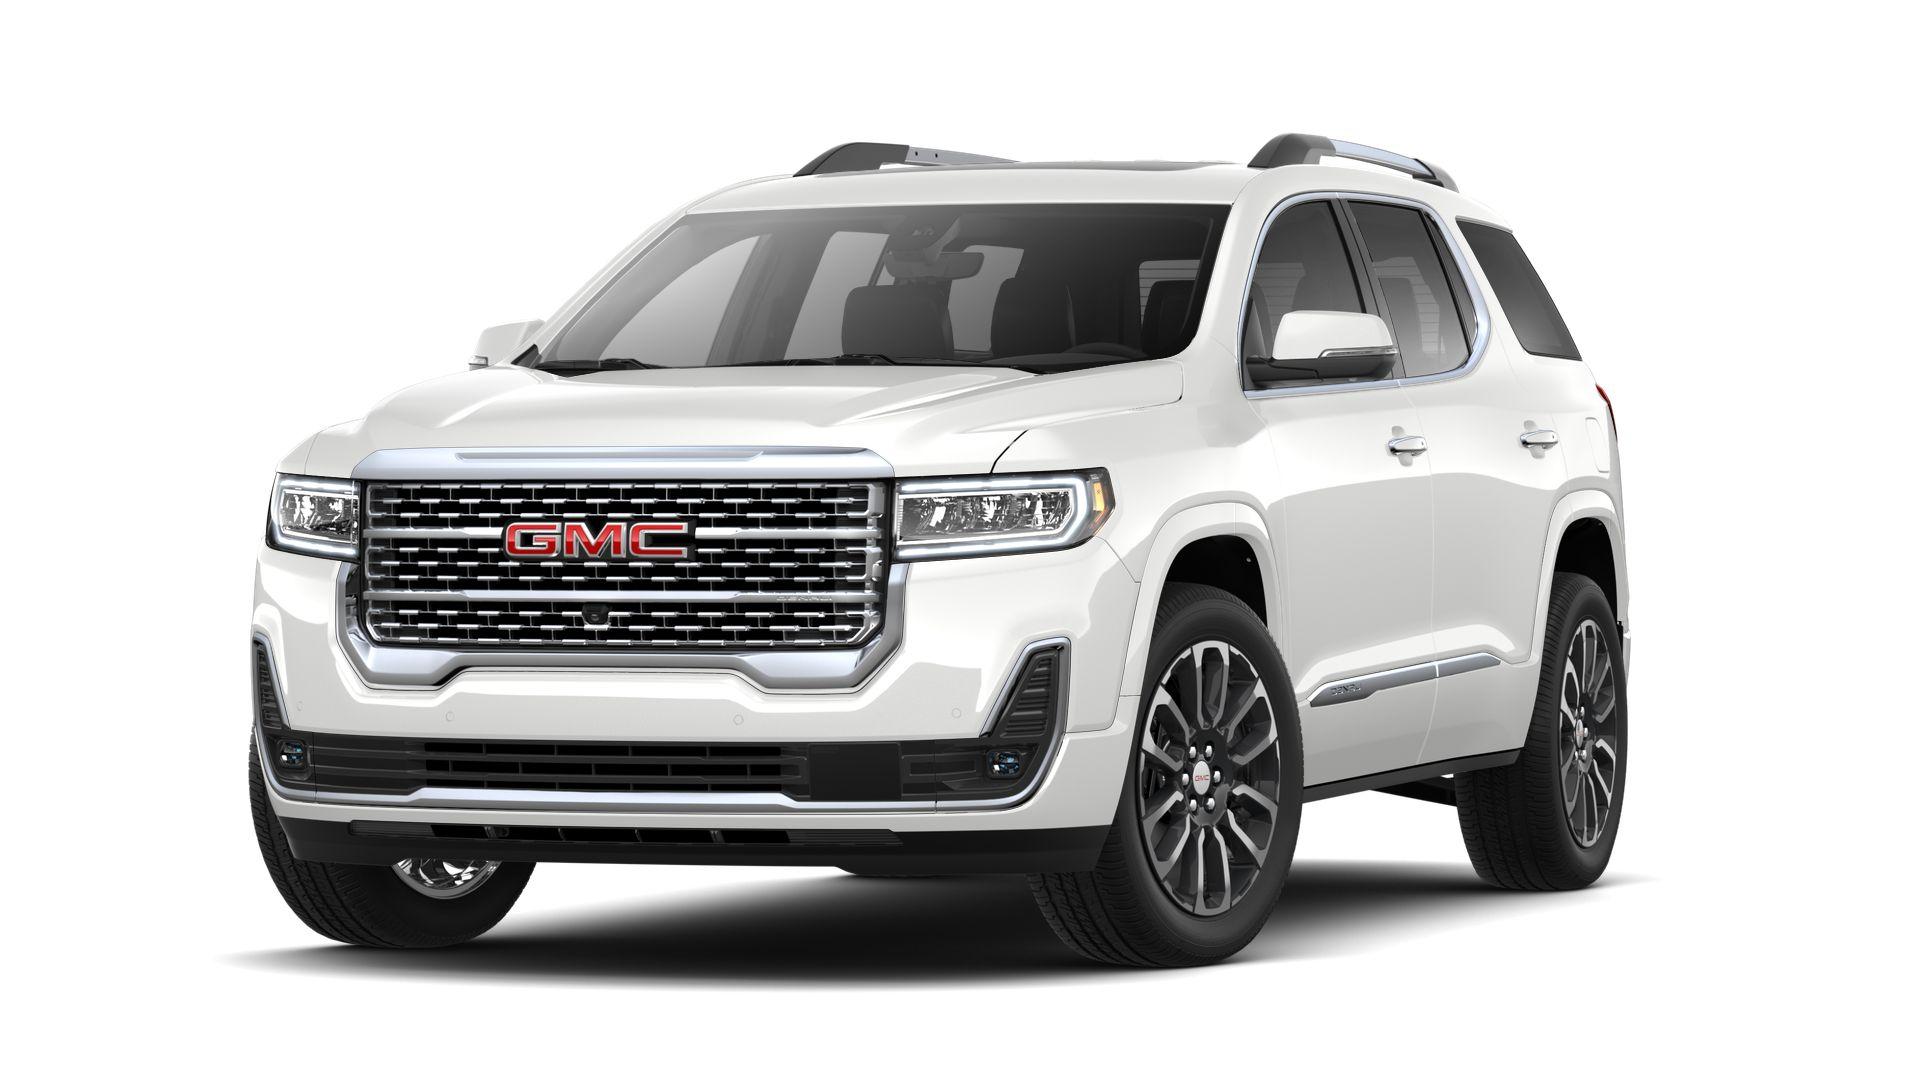 2021 GMC Acadia SUV